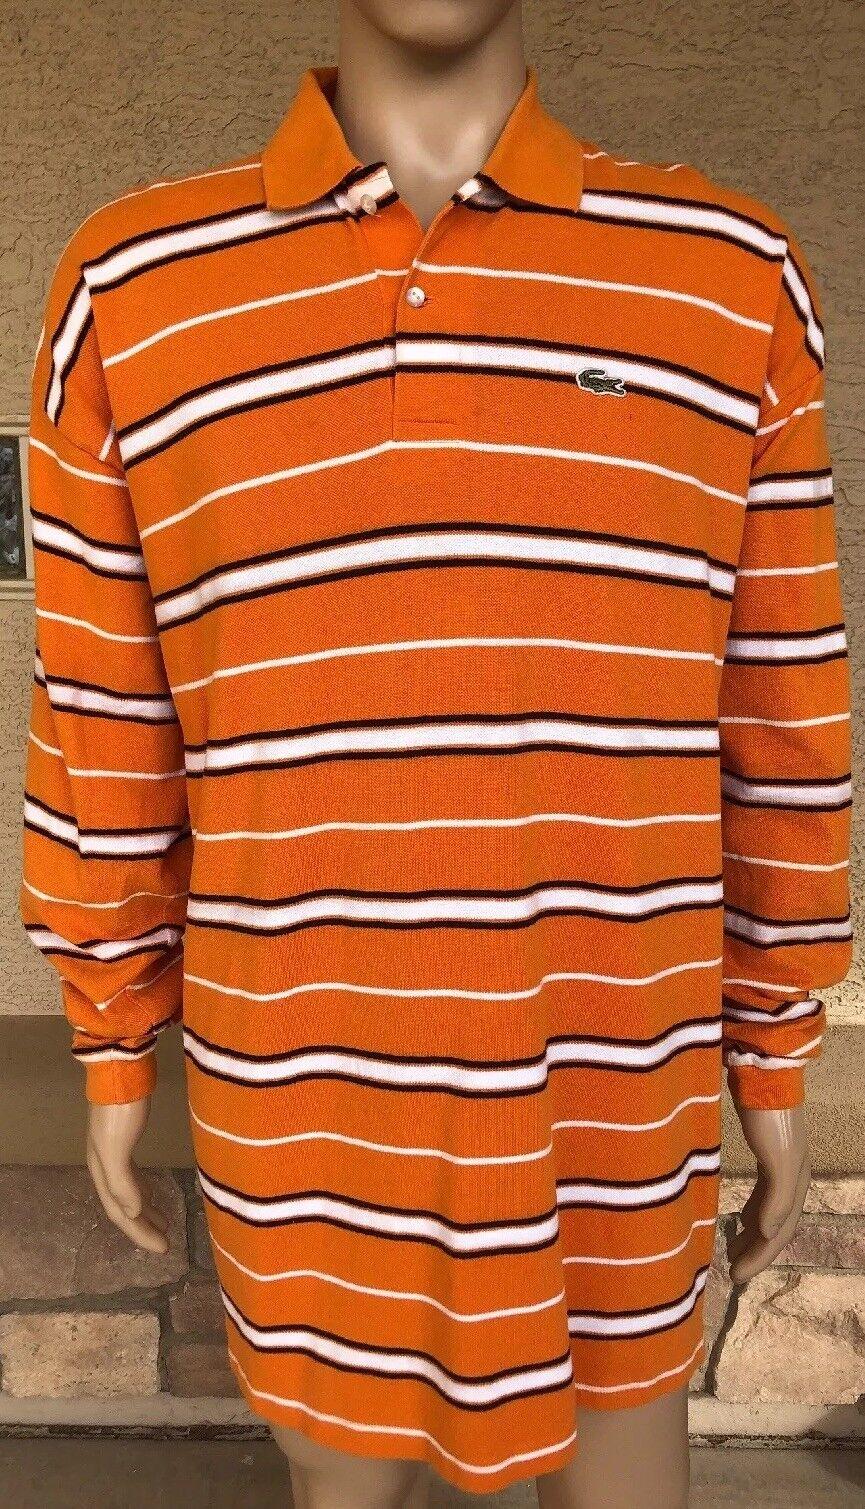 ad8edce79 Vintage Lacoste orange   White Retro Striped Long Sleeve Polo Shirt Size 12